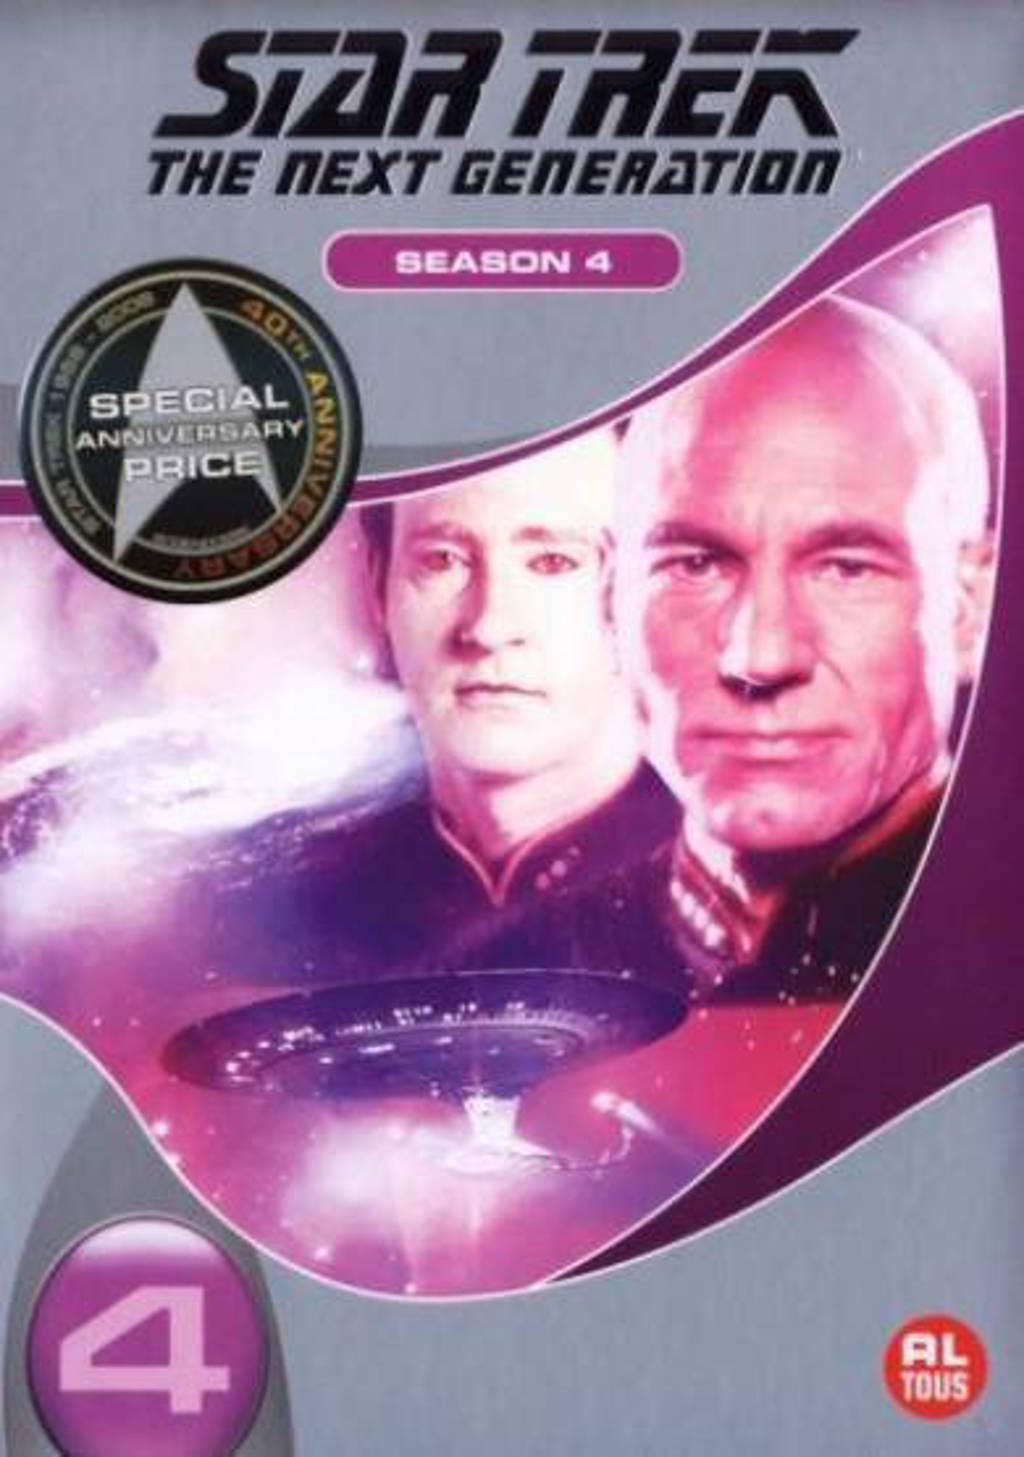 Star trek the next generation - Seizoen 4 (DVD)